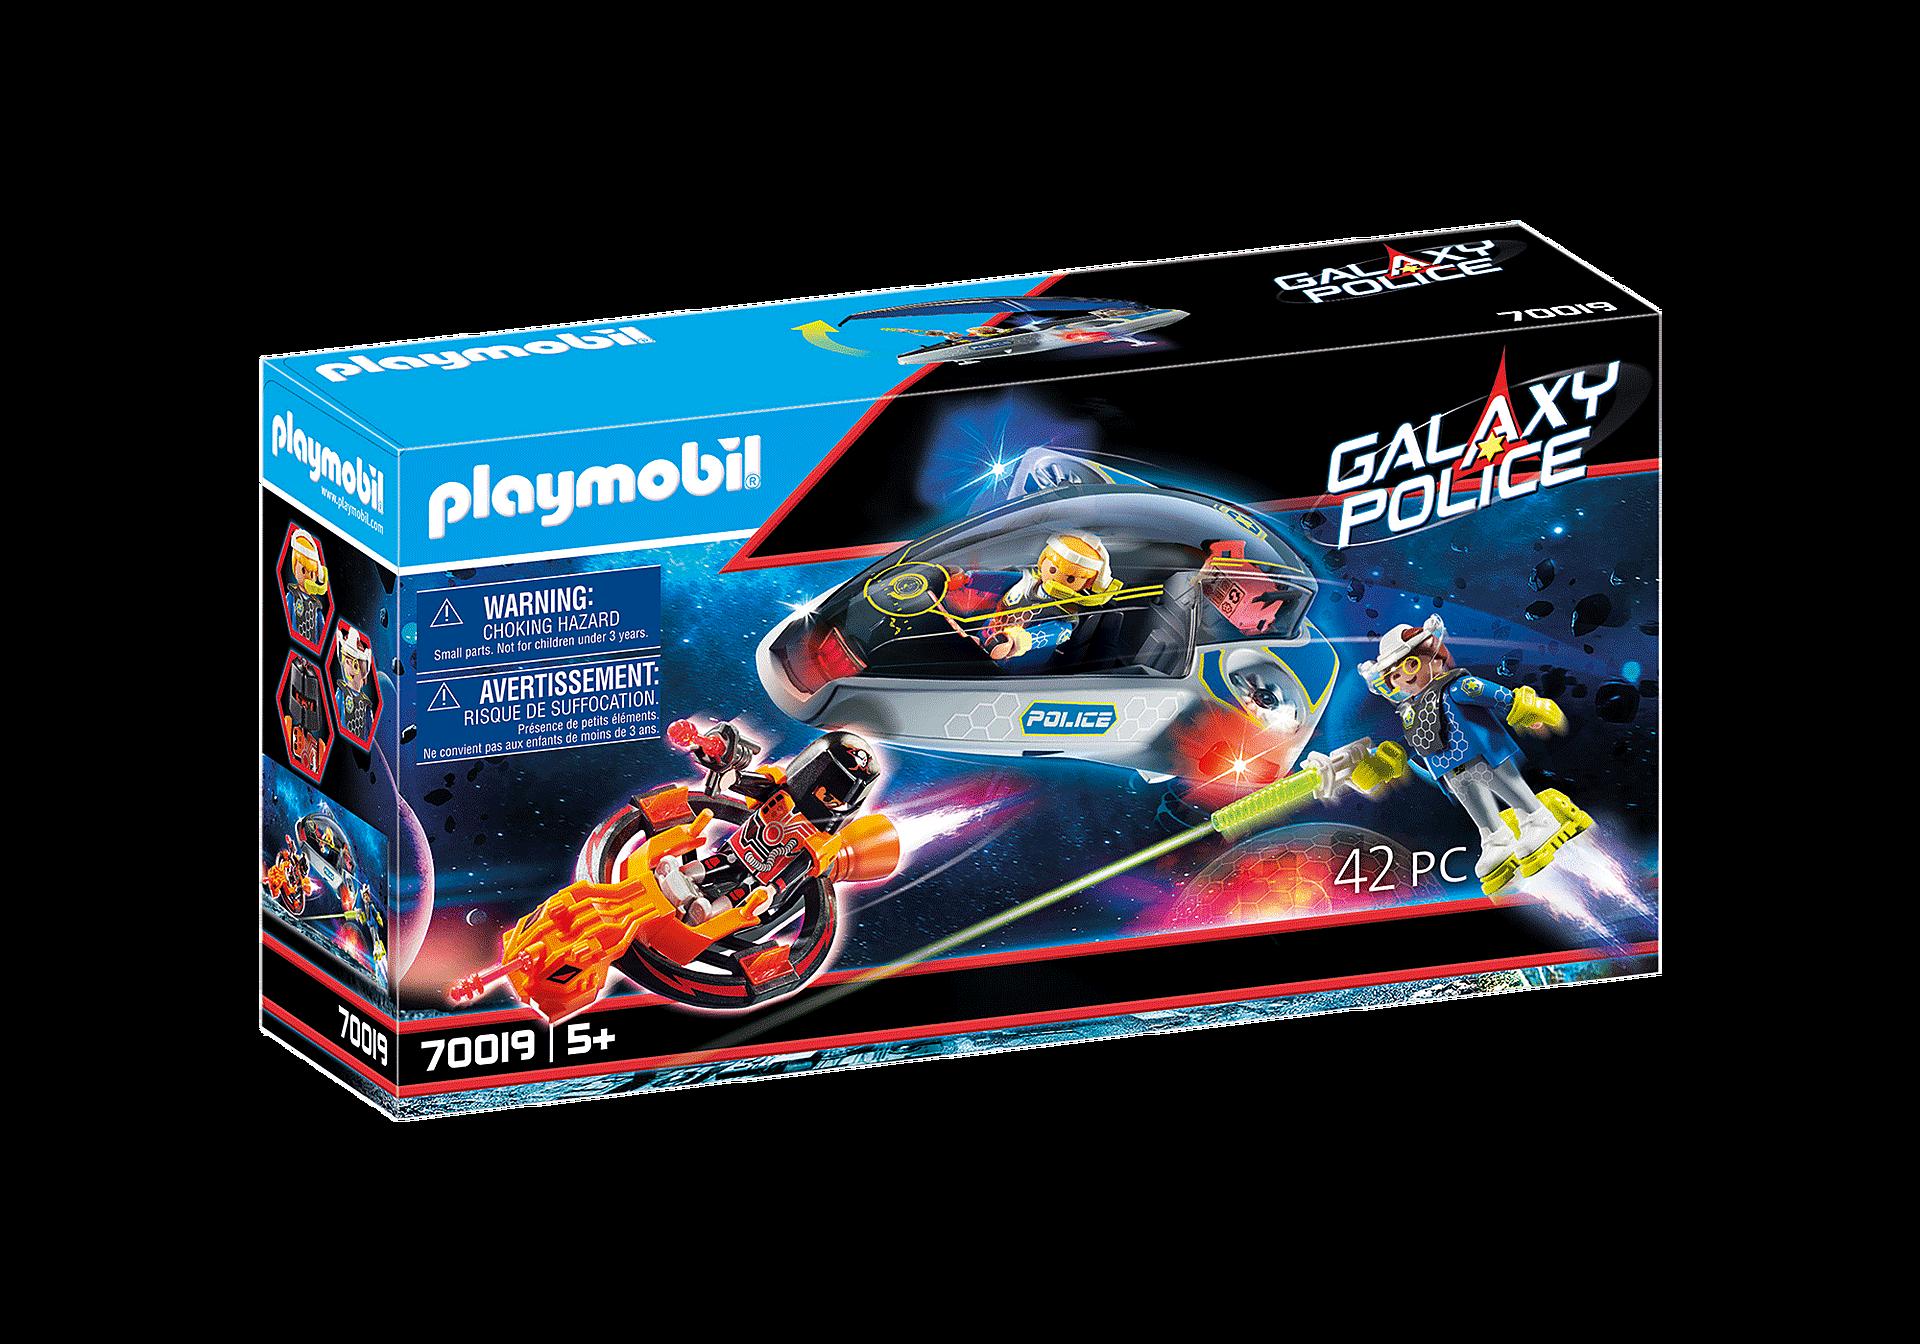 Playmobil - Galaxy Police Glider (70019)